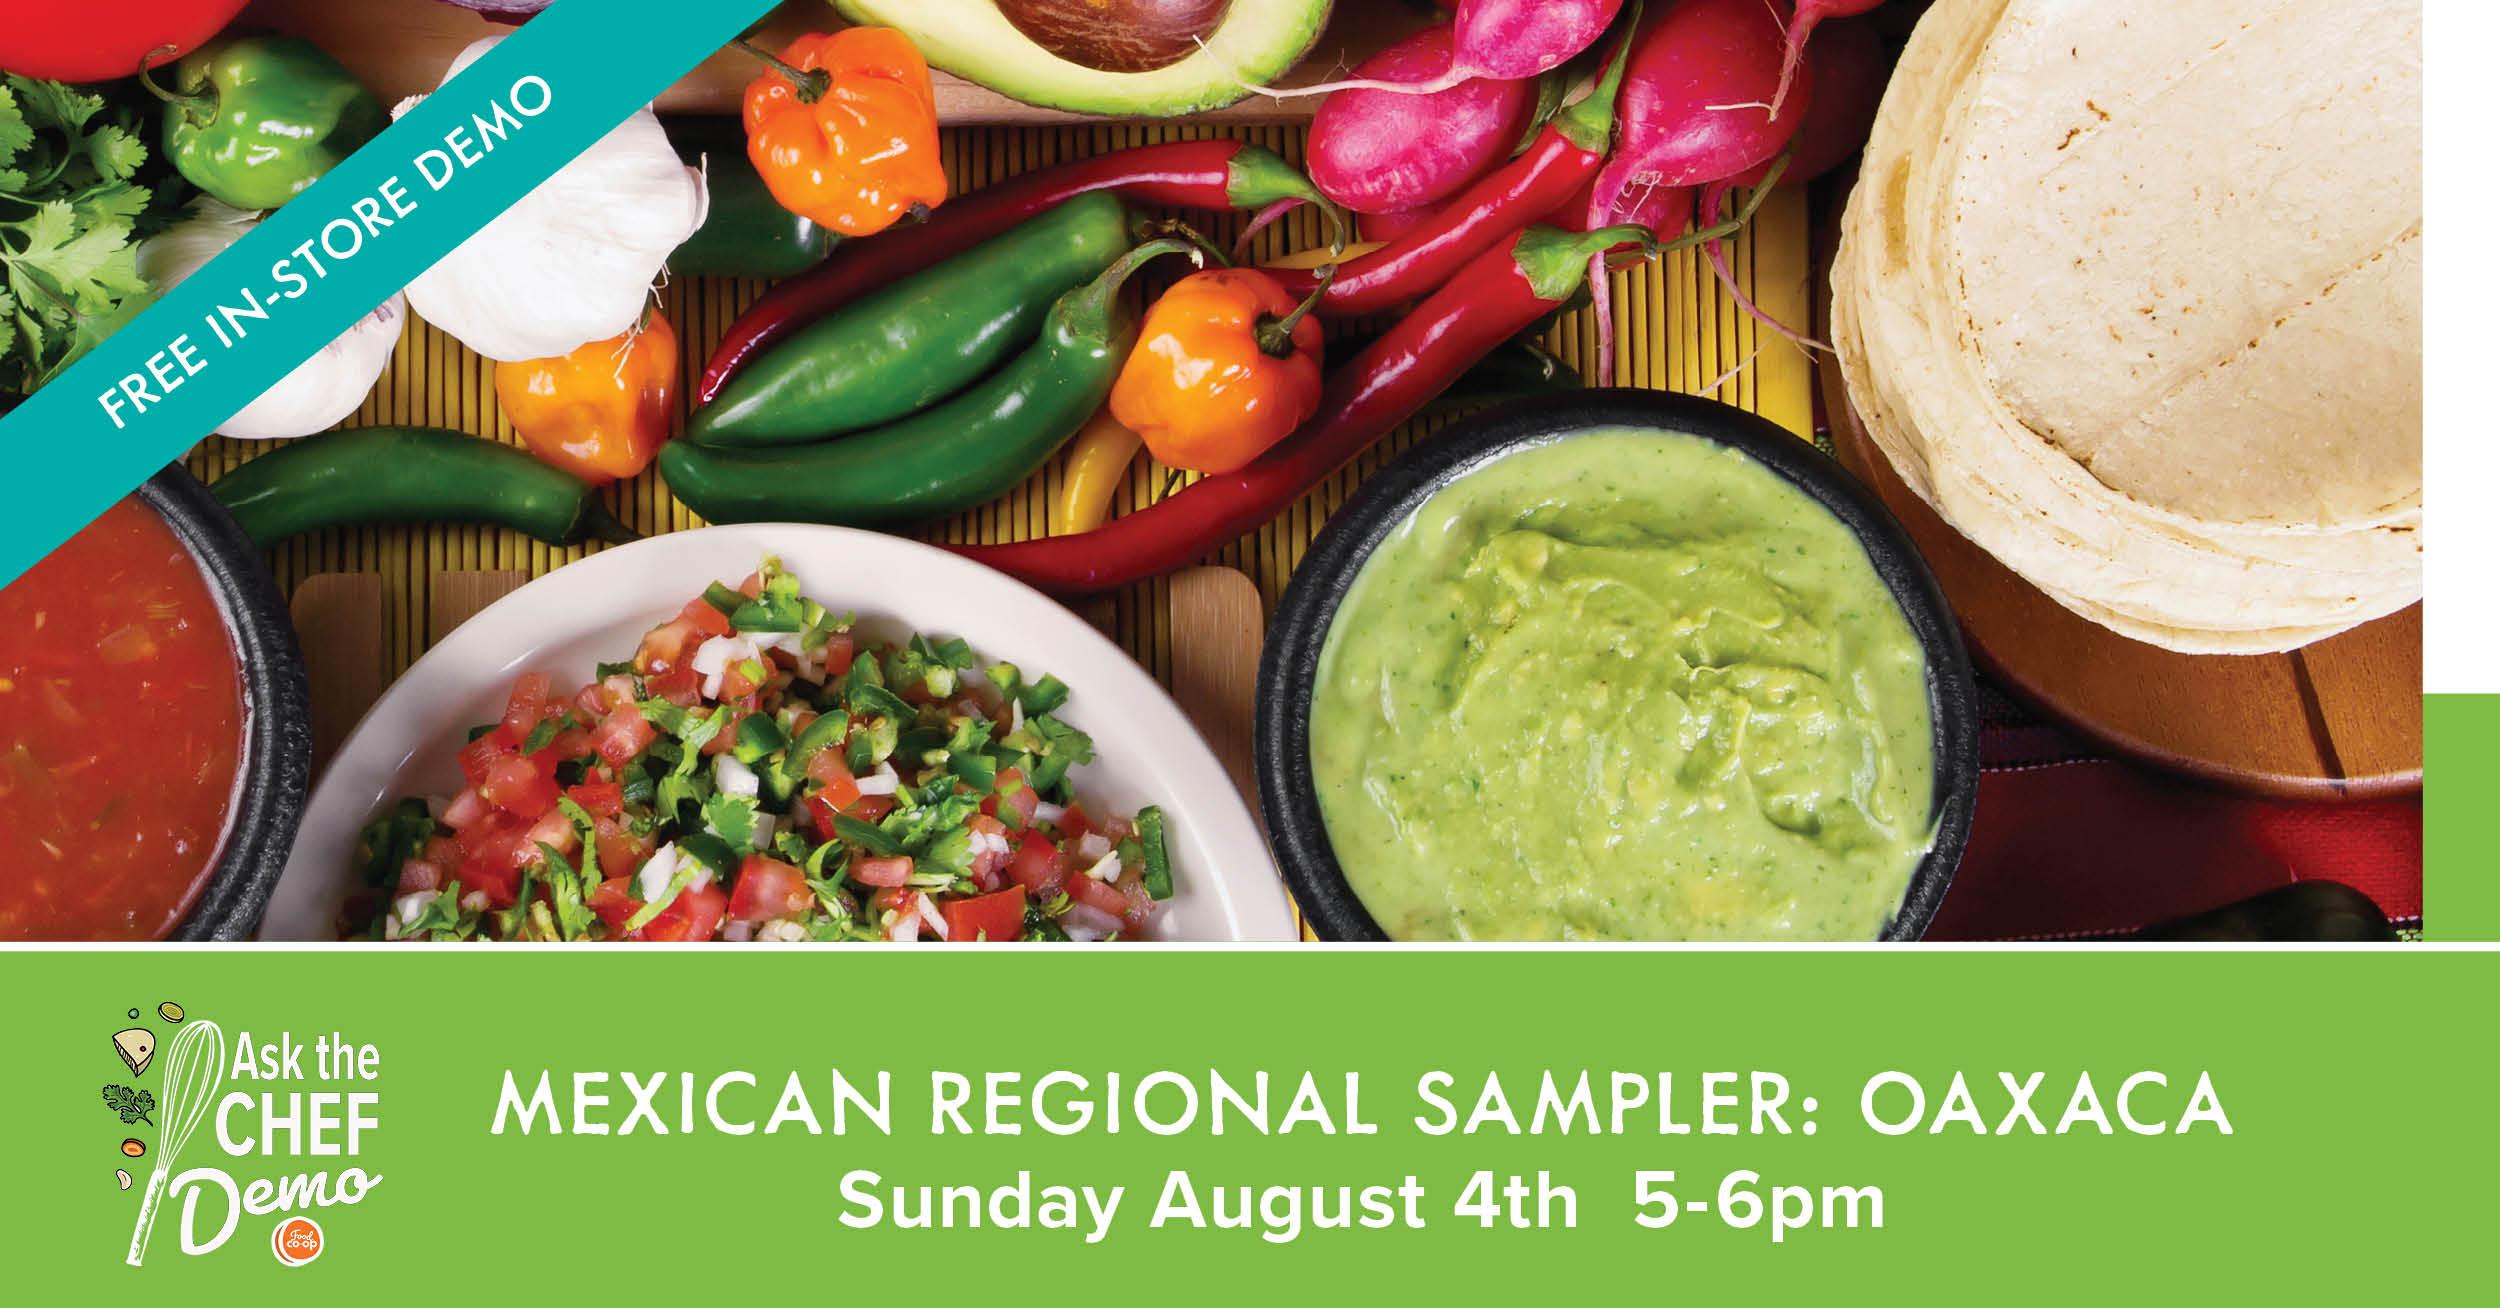 Ask the Chef DEMO Oaxaca Aug 2019_FB.jpg